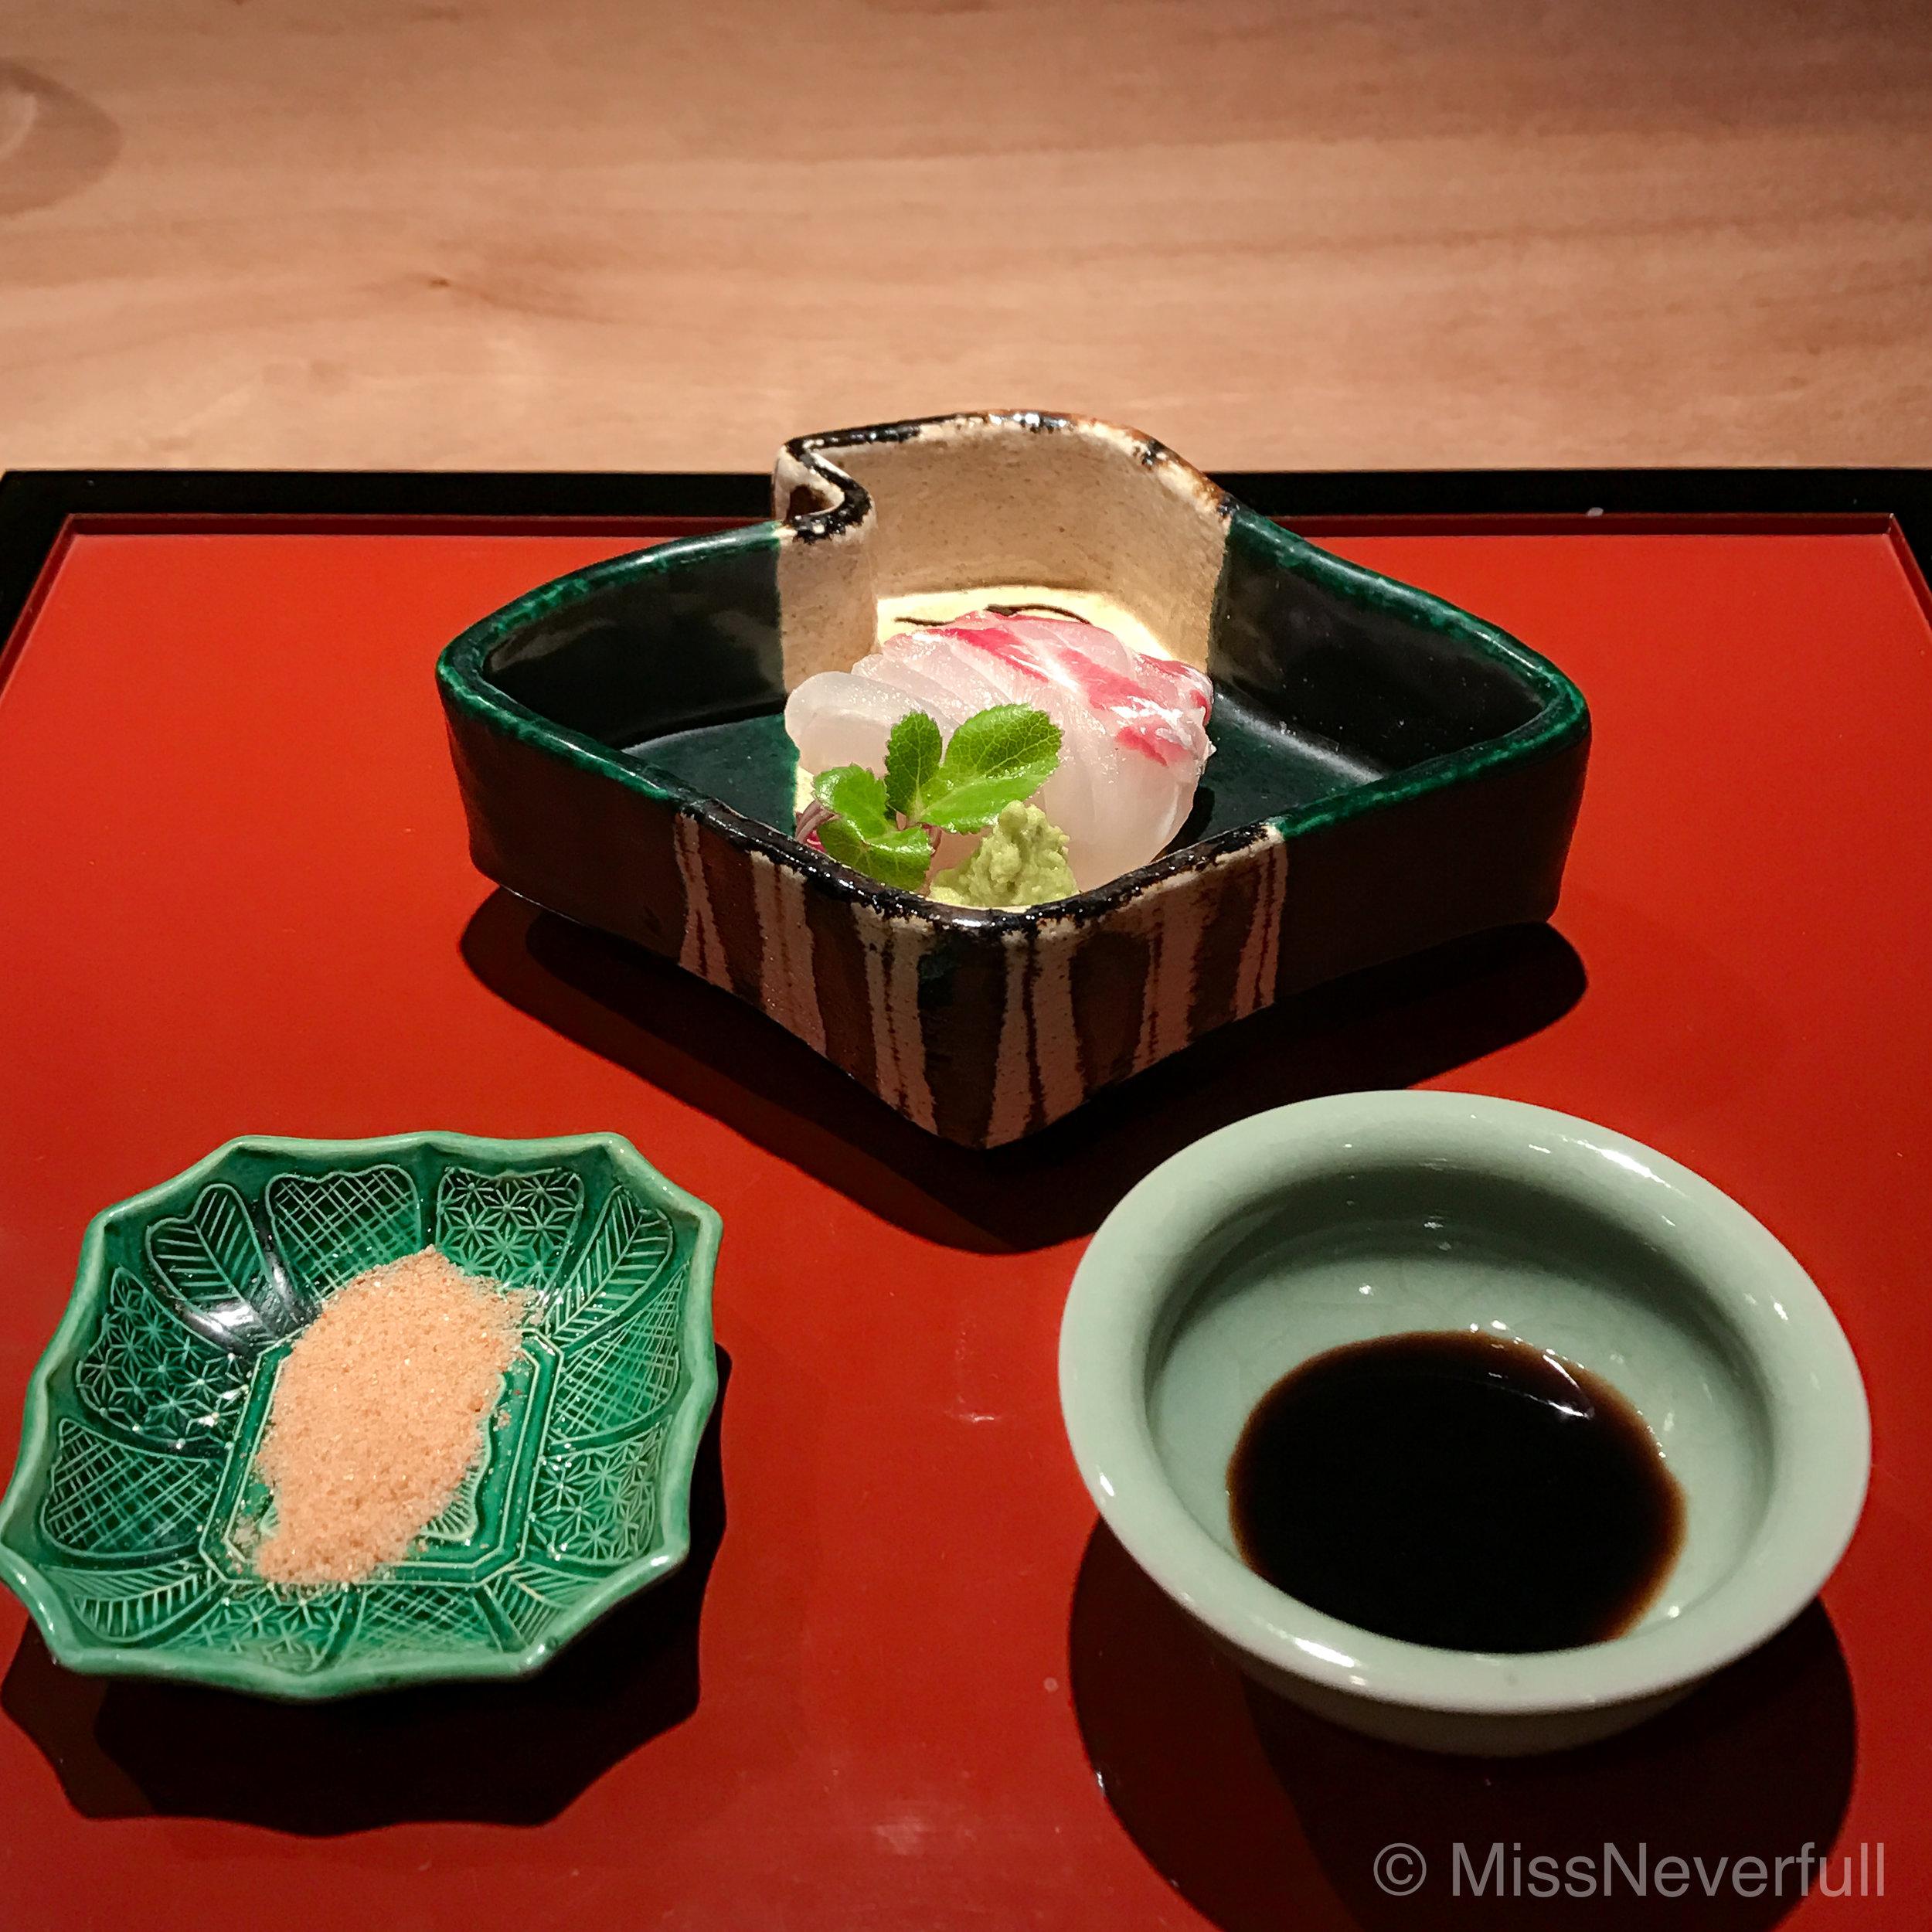 6. Tai (sea bream) sashimi